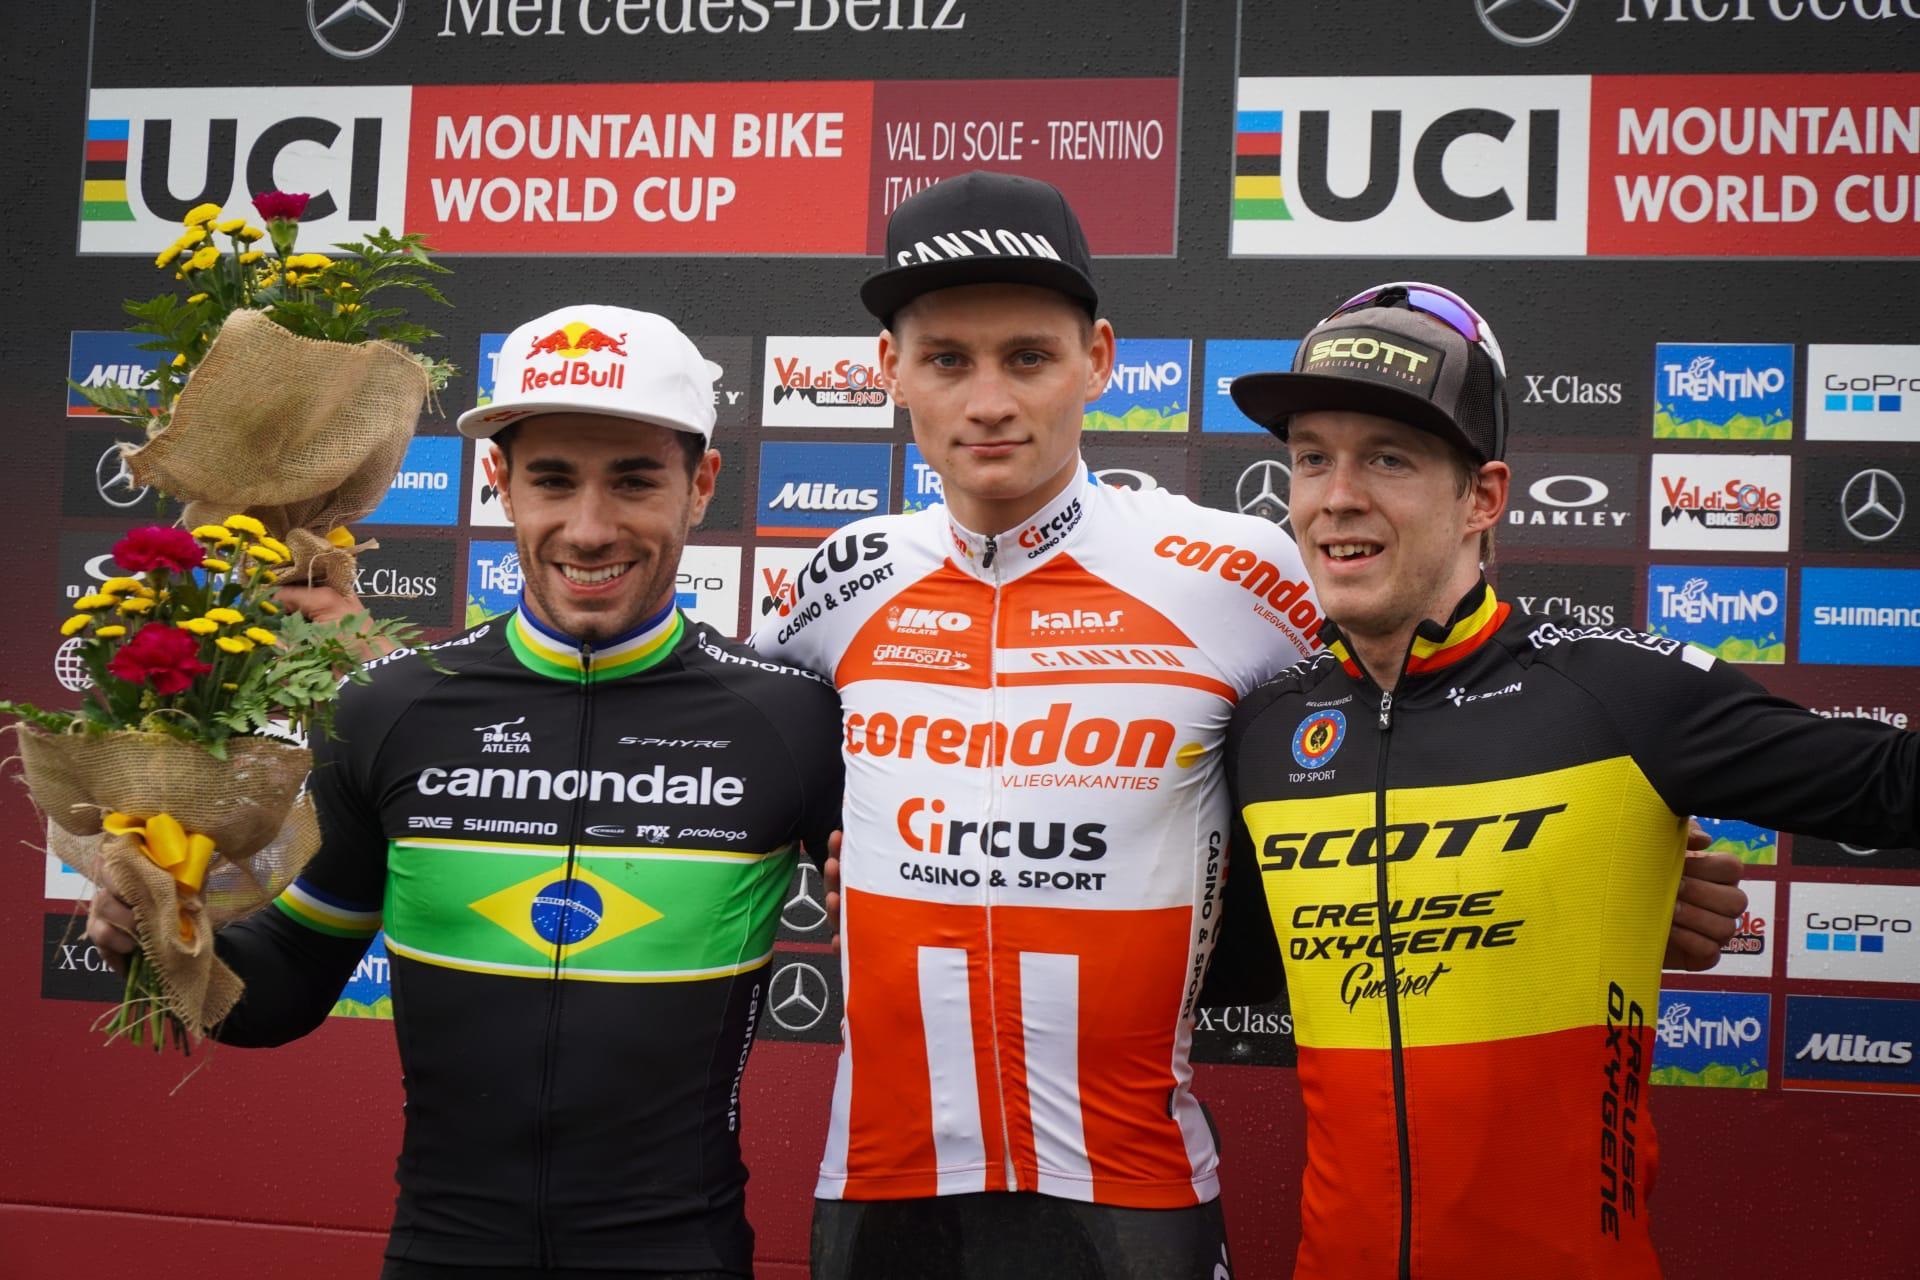 van der Poel en Neff winnen short track in Val di Sole, Jens Schuermans knap derde